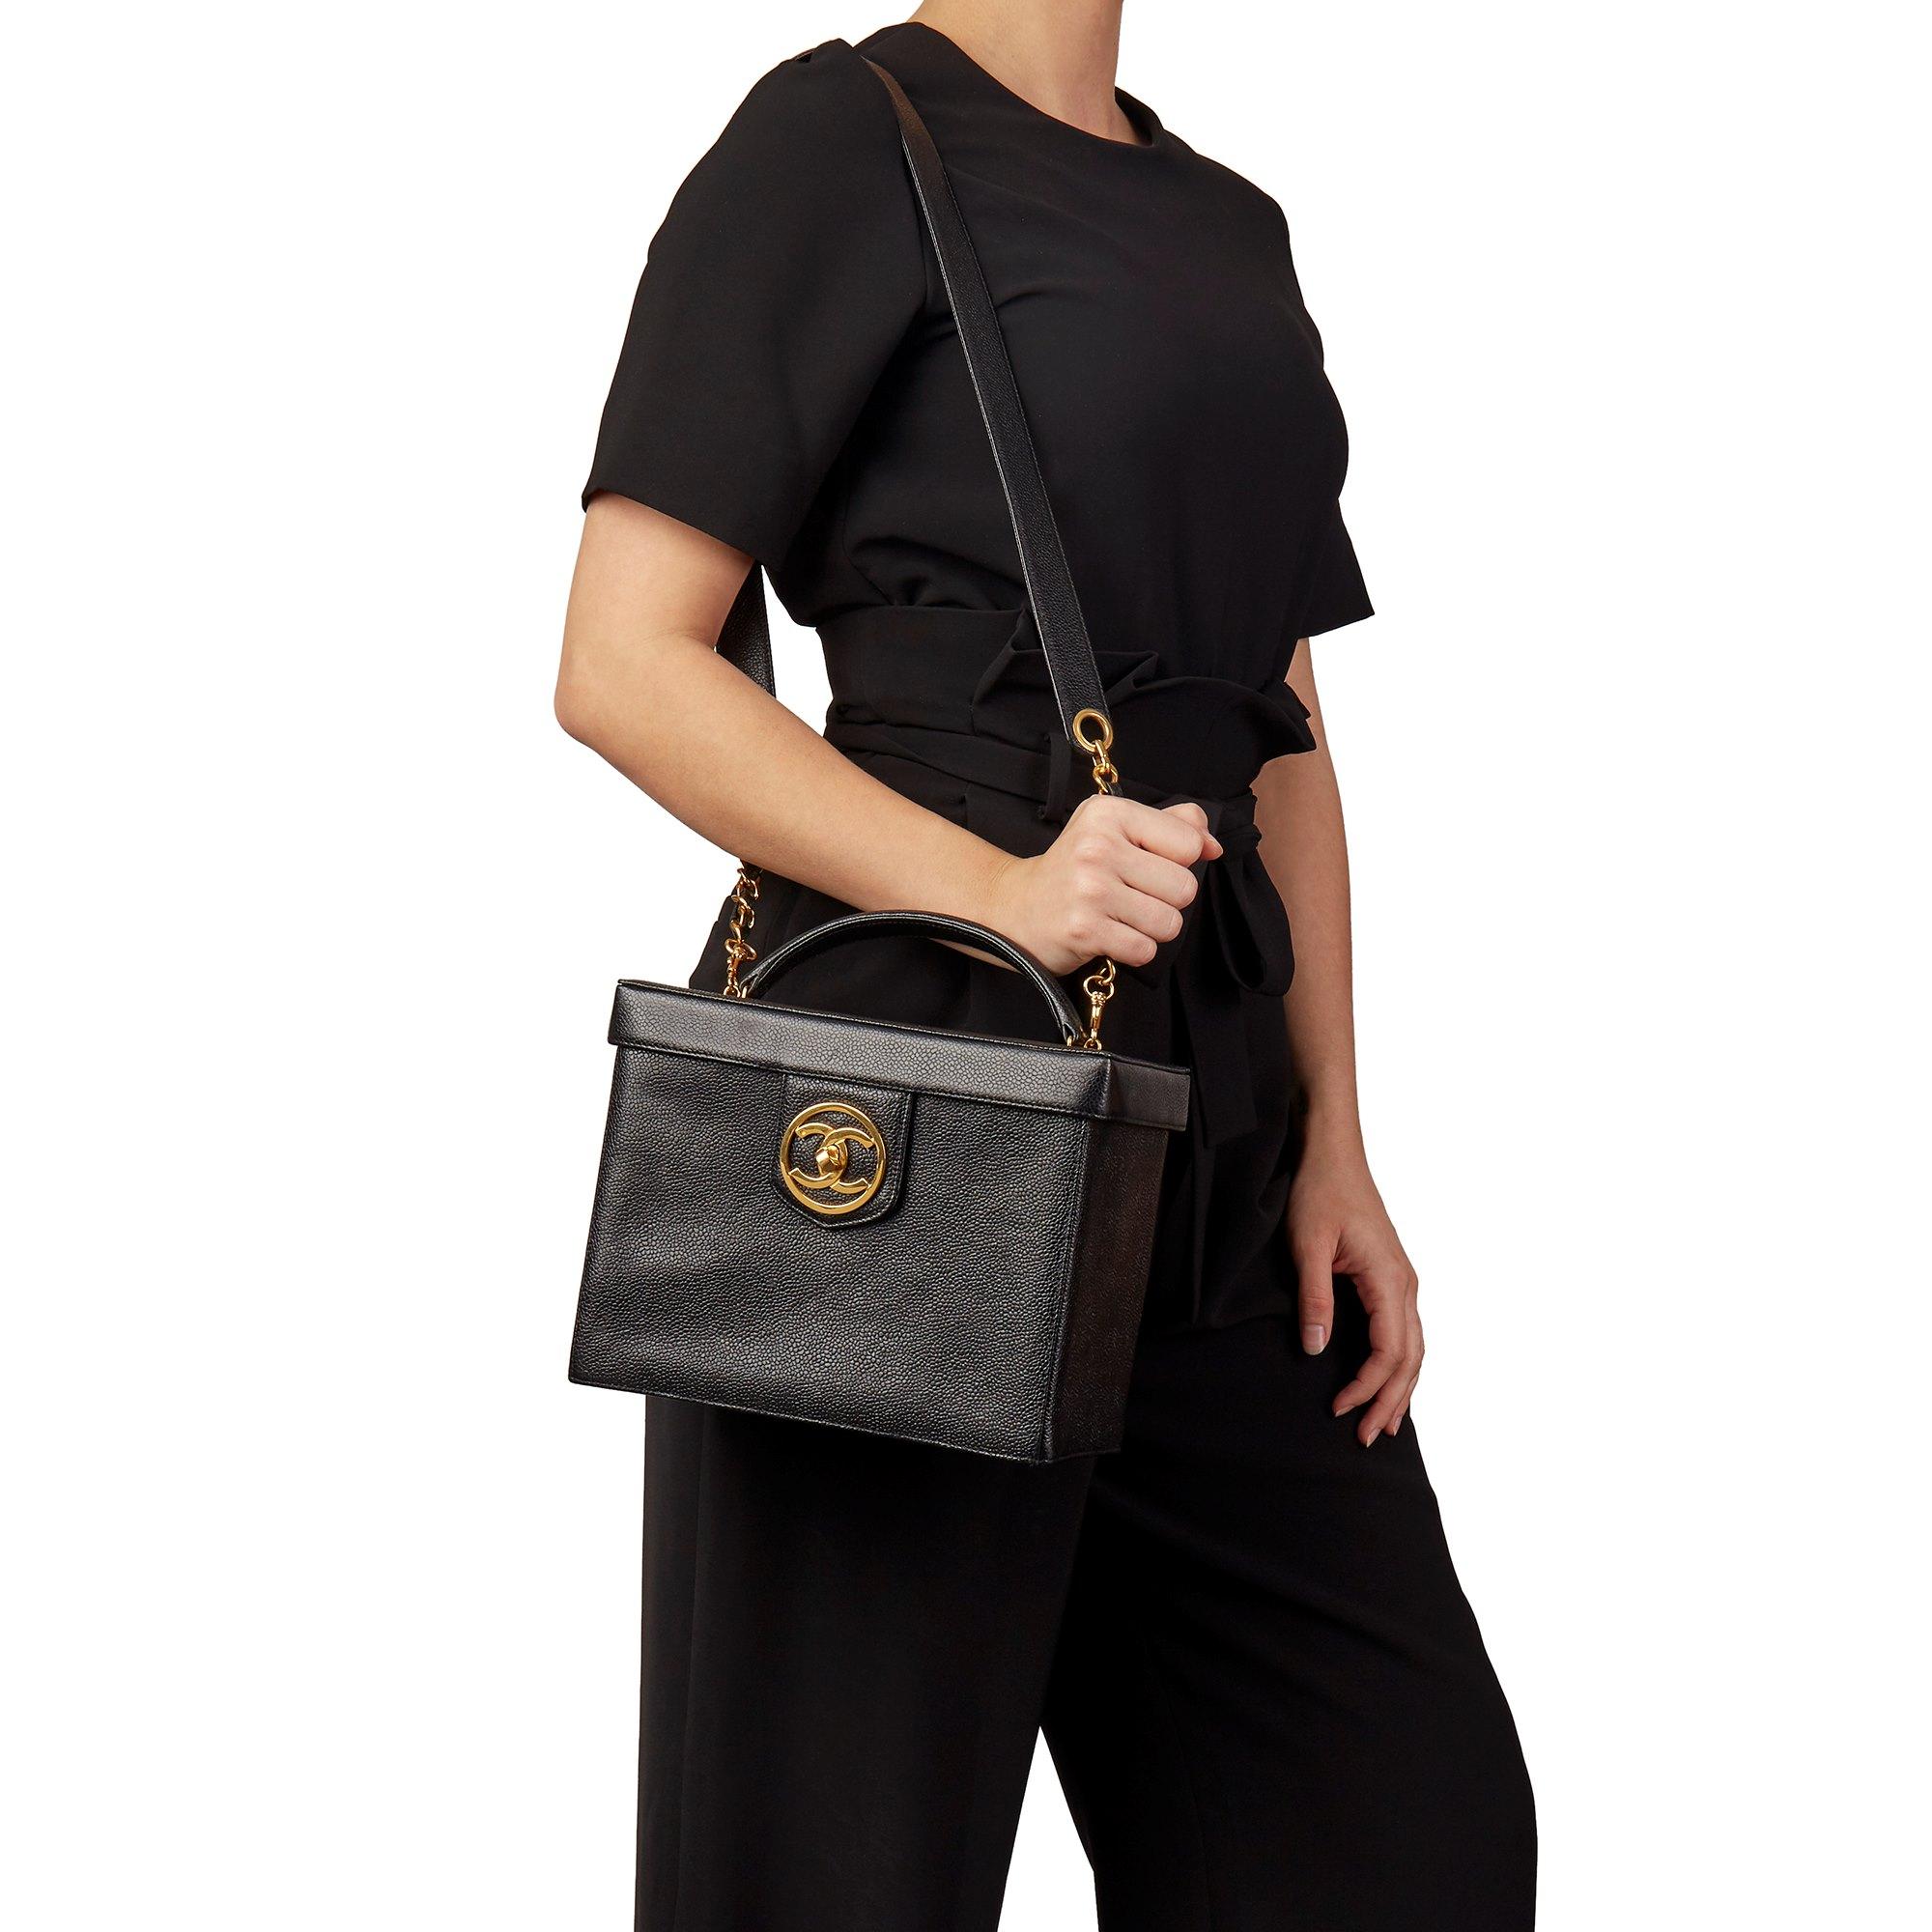 Chanel Black Caviar Leather Vintage Classic Vanity Case